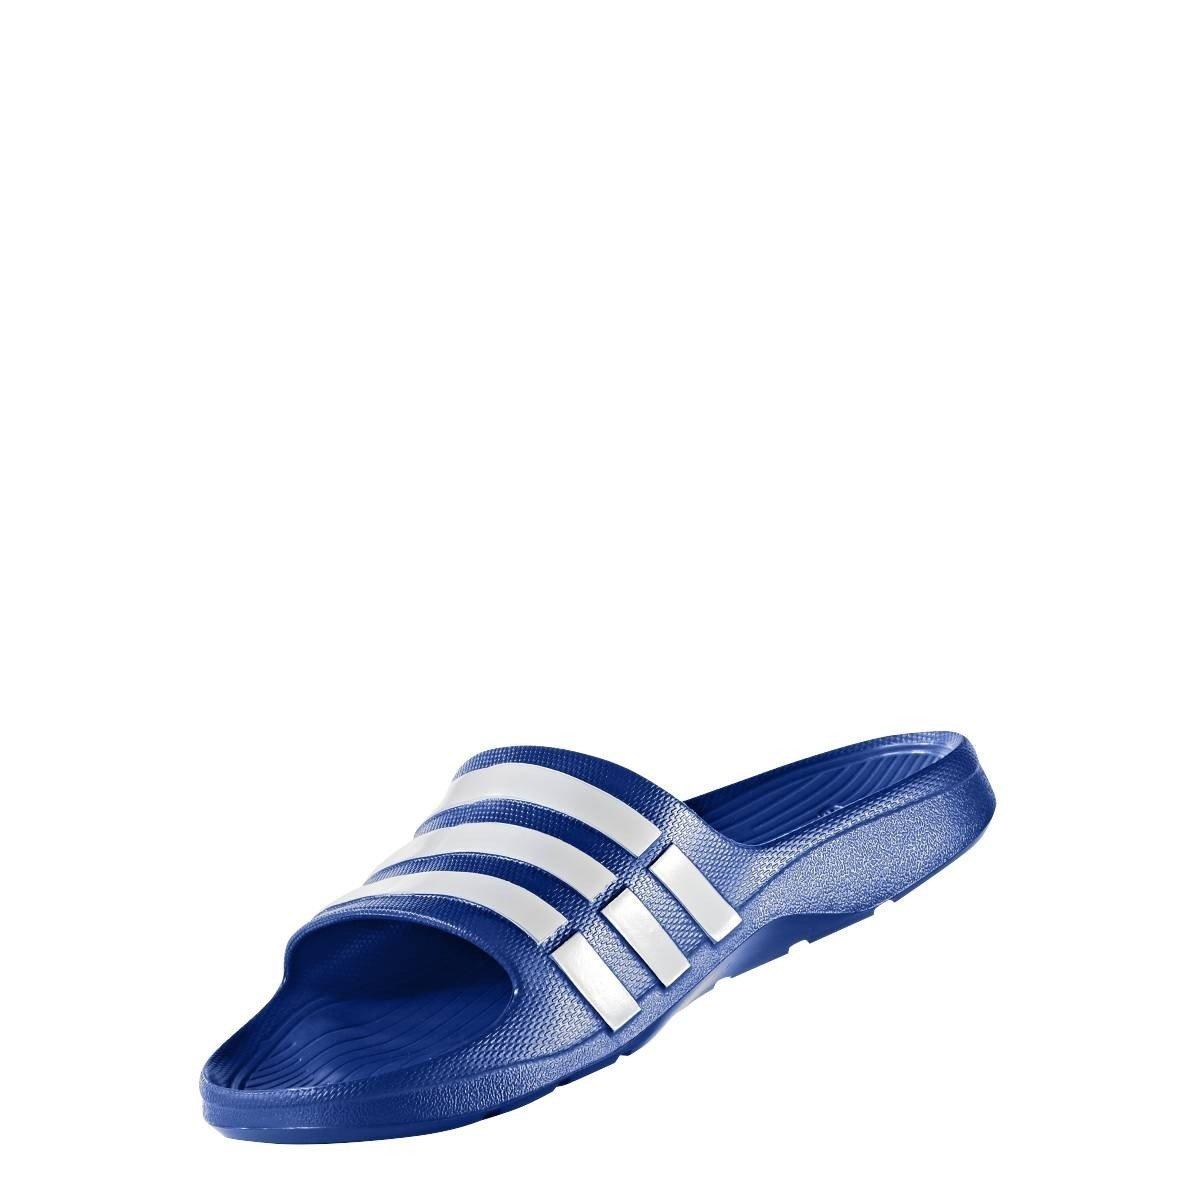 adidas Duramo Slide - natation Mules natation - Mixte Adulte adidas Bleu Bleu 910185b - piero.space